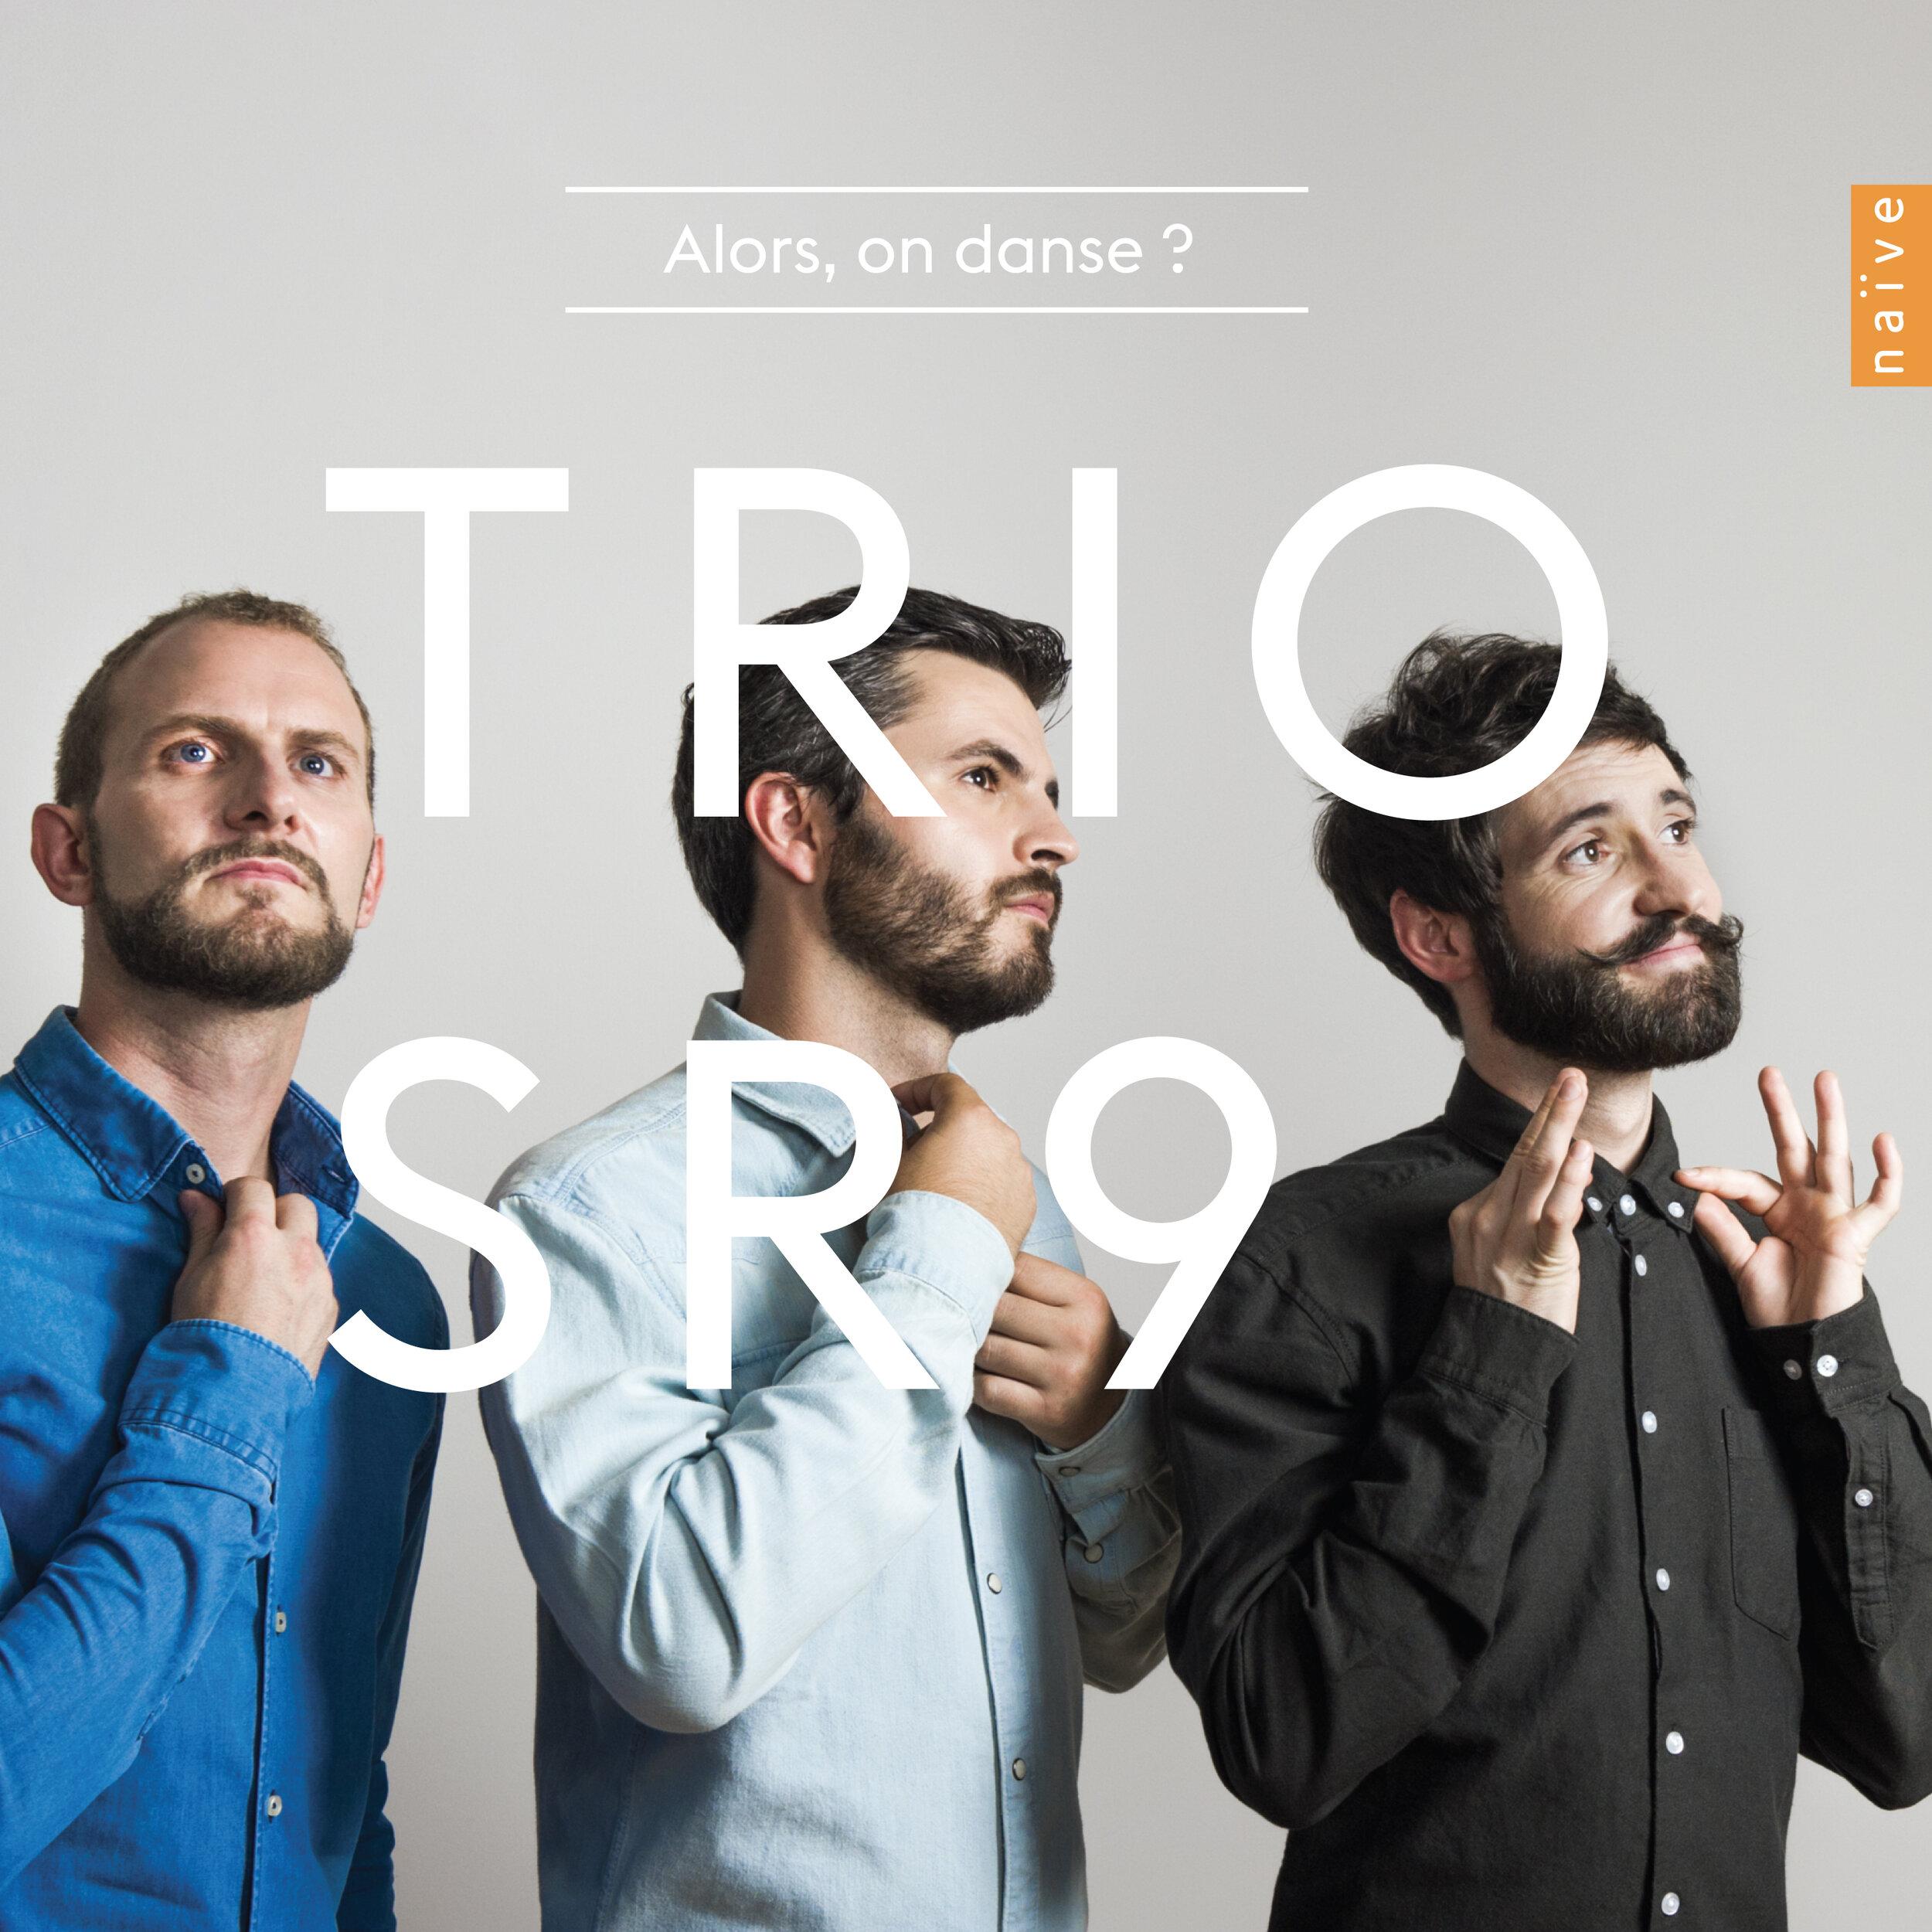 V5449 K Alors on danse Trio SR9 3000x3000.jpg